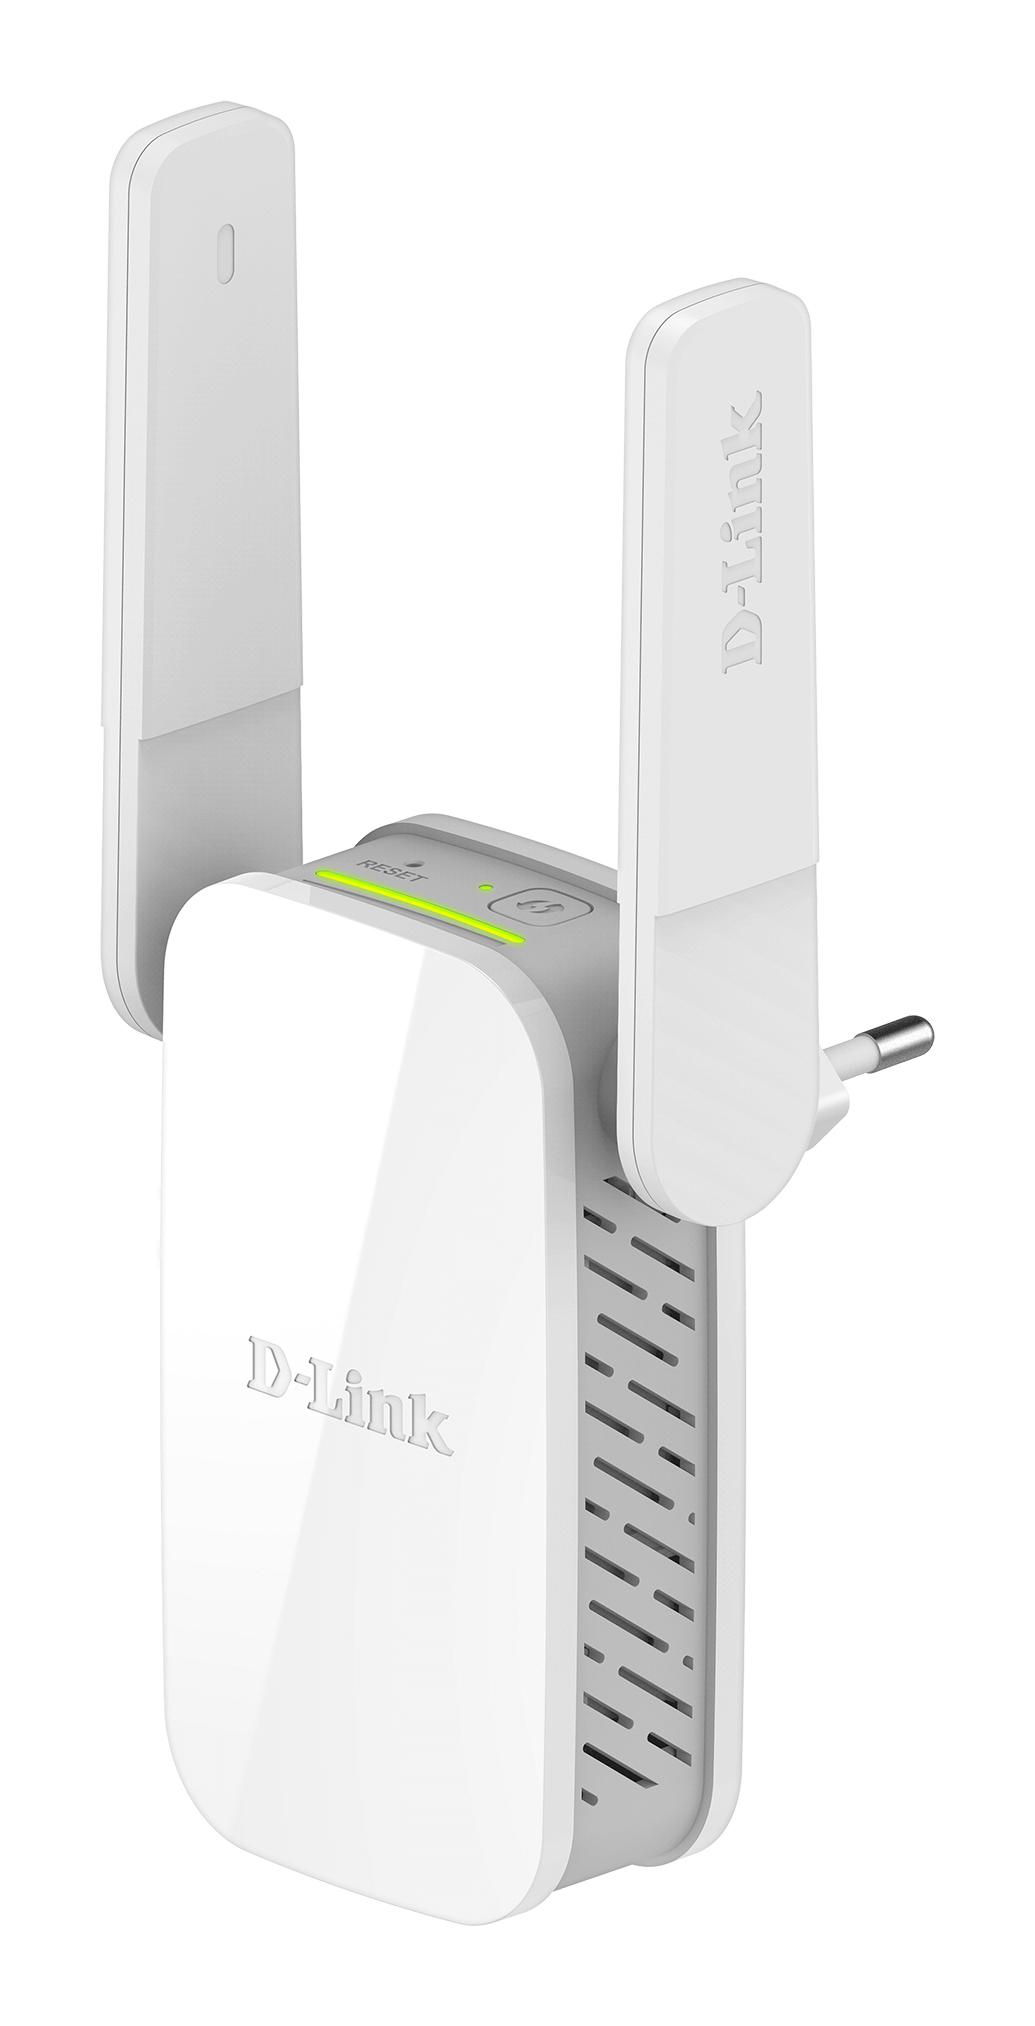 DAP-1610/E Wireless AC1200 Dual Band Range Extender (2x2 11ac, 1200 Mbps)